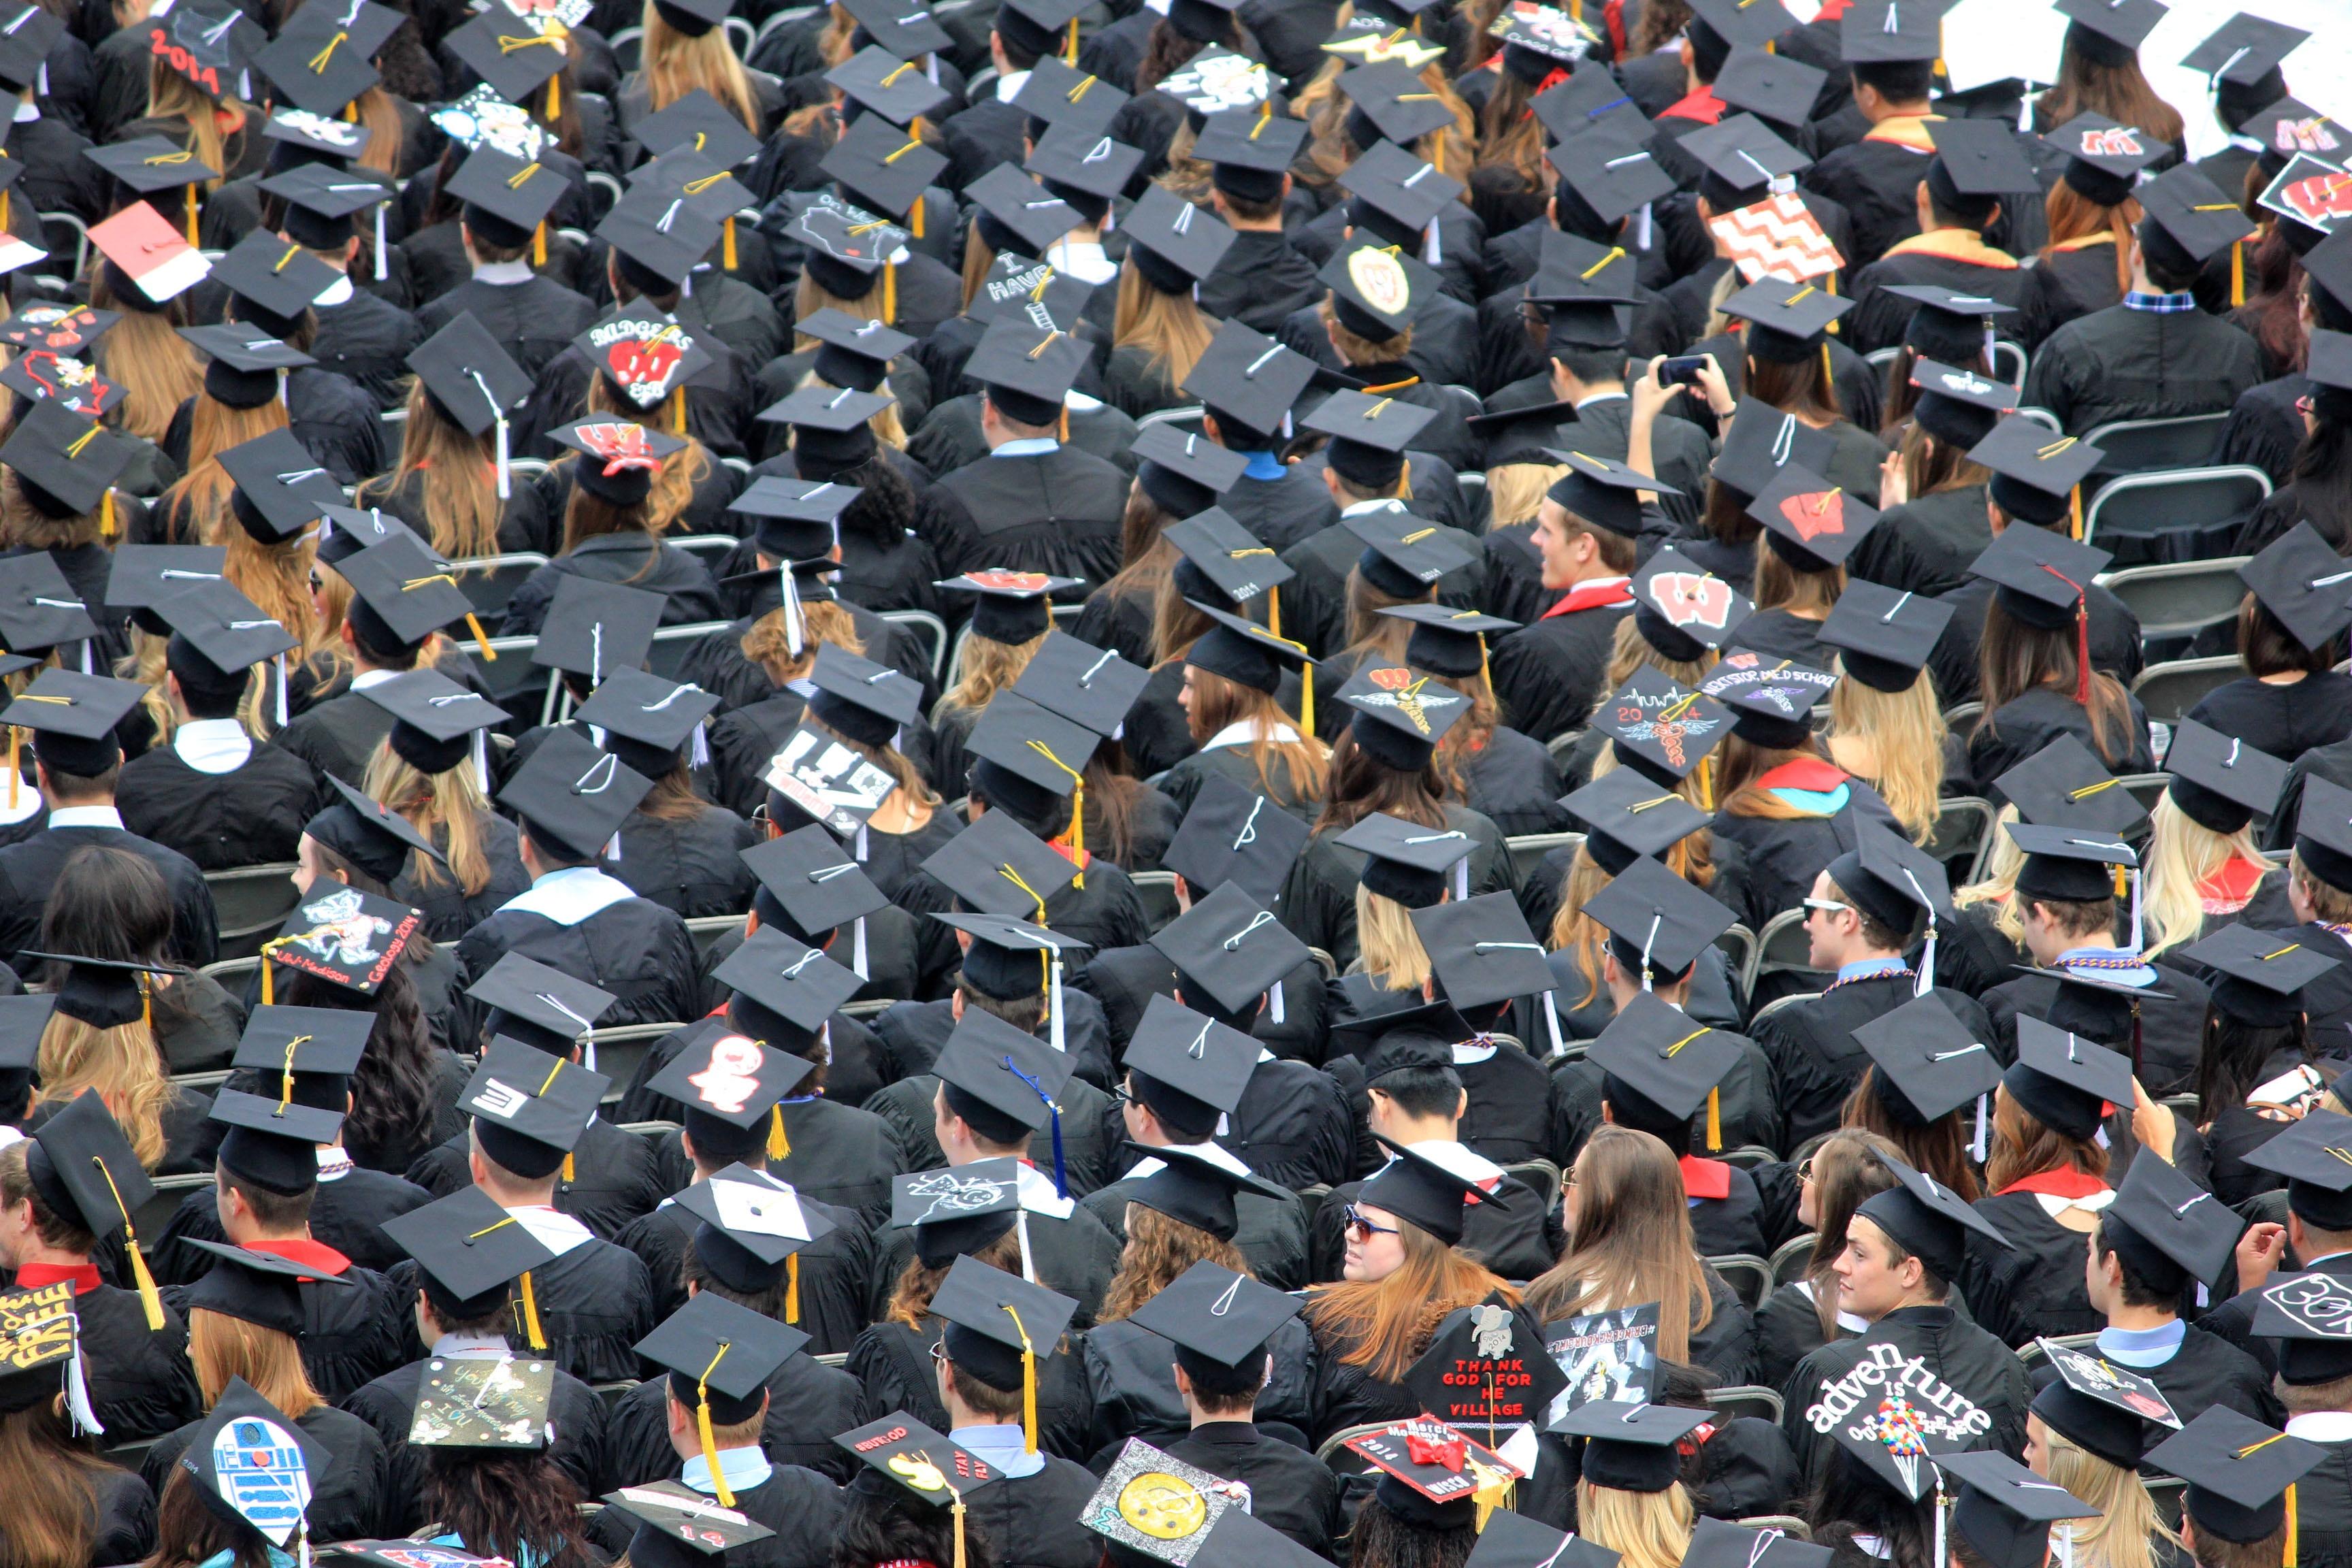 #AquíSonBienvenidos, Universidades de EU ofrecen becas para extranjeros